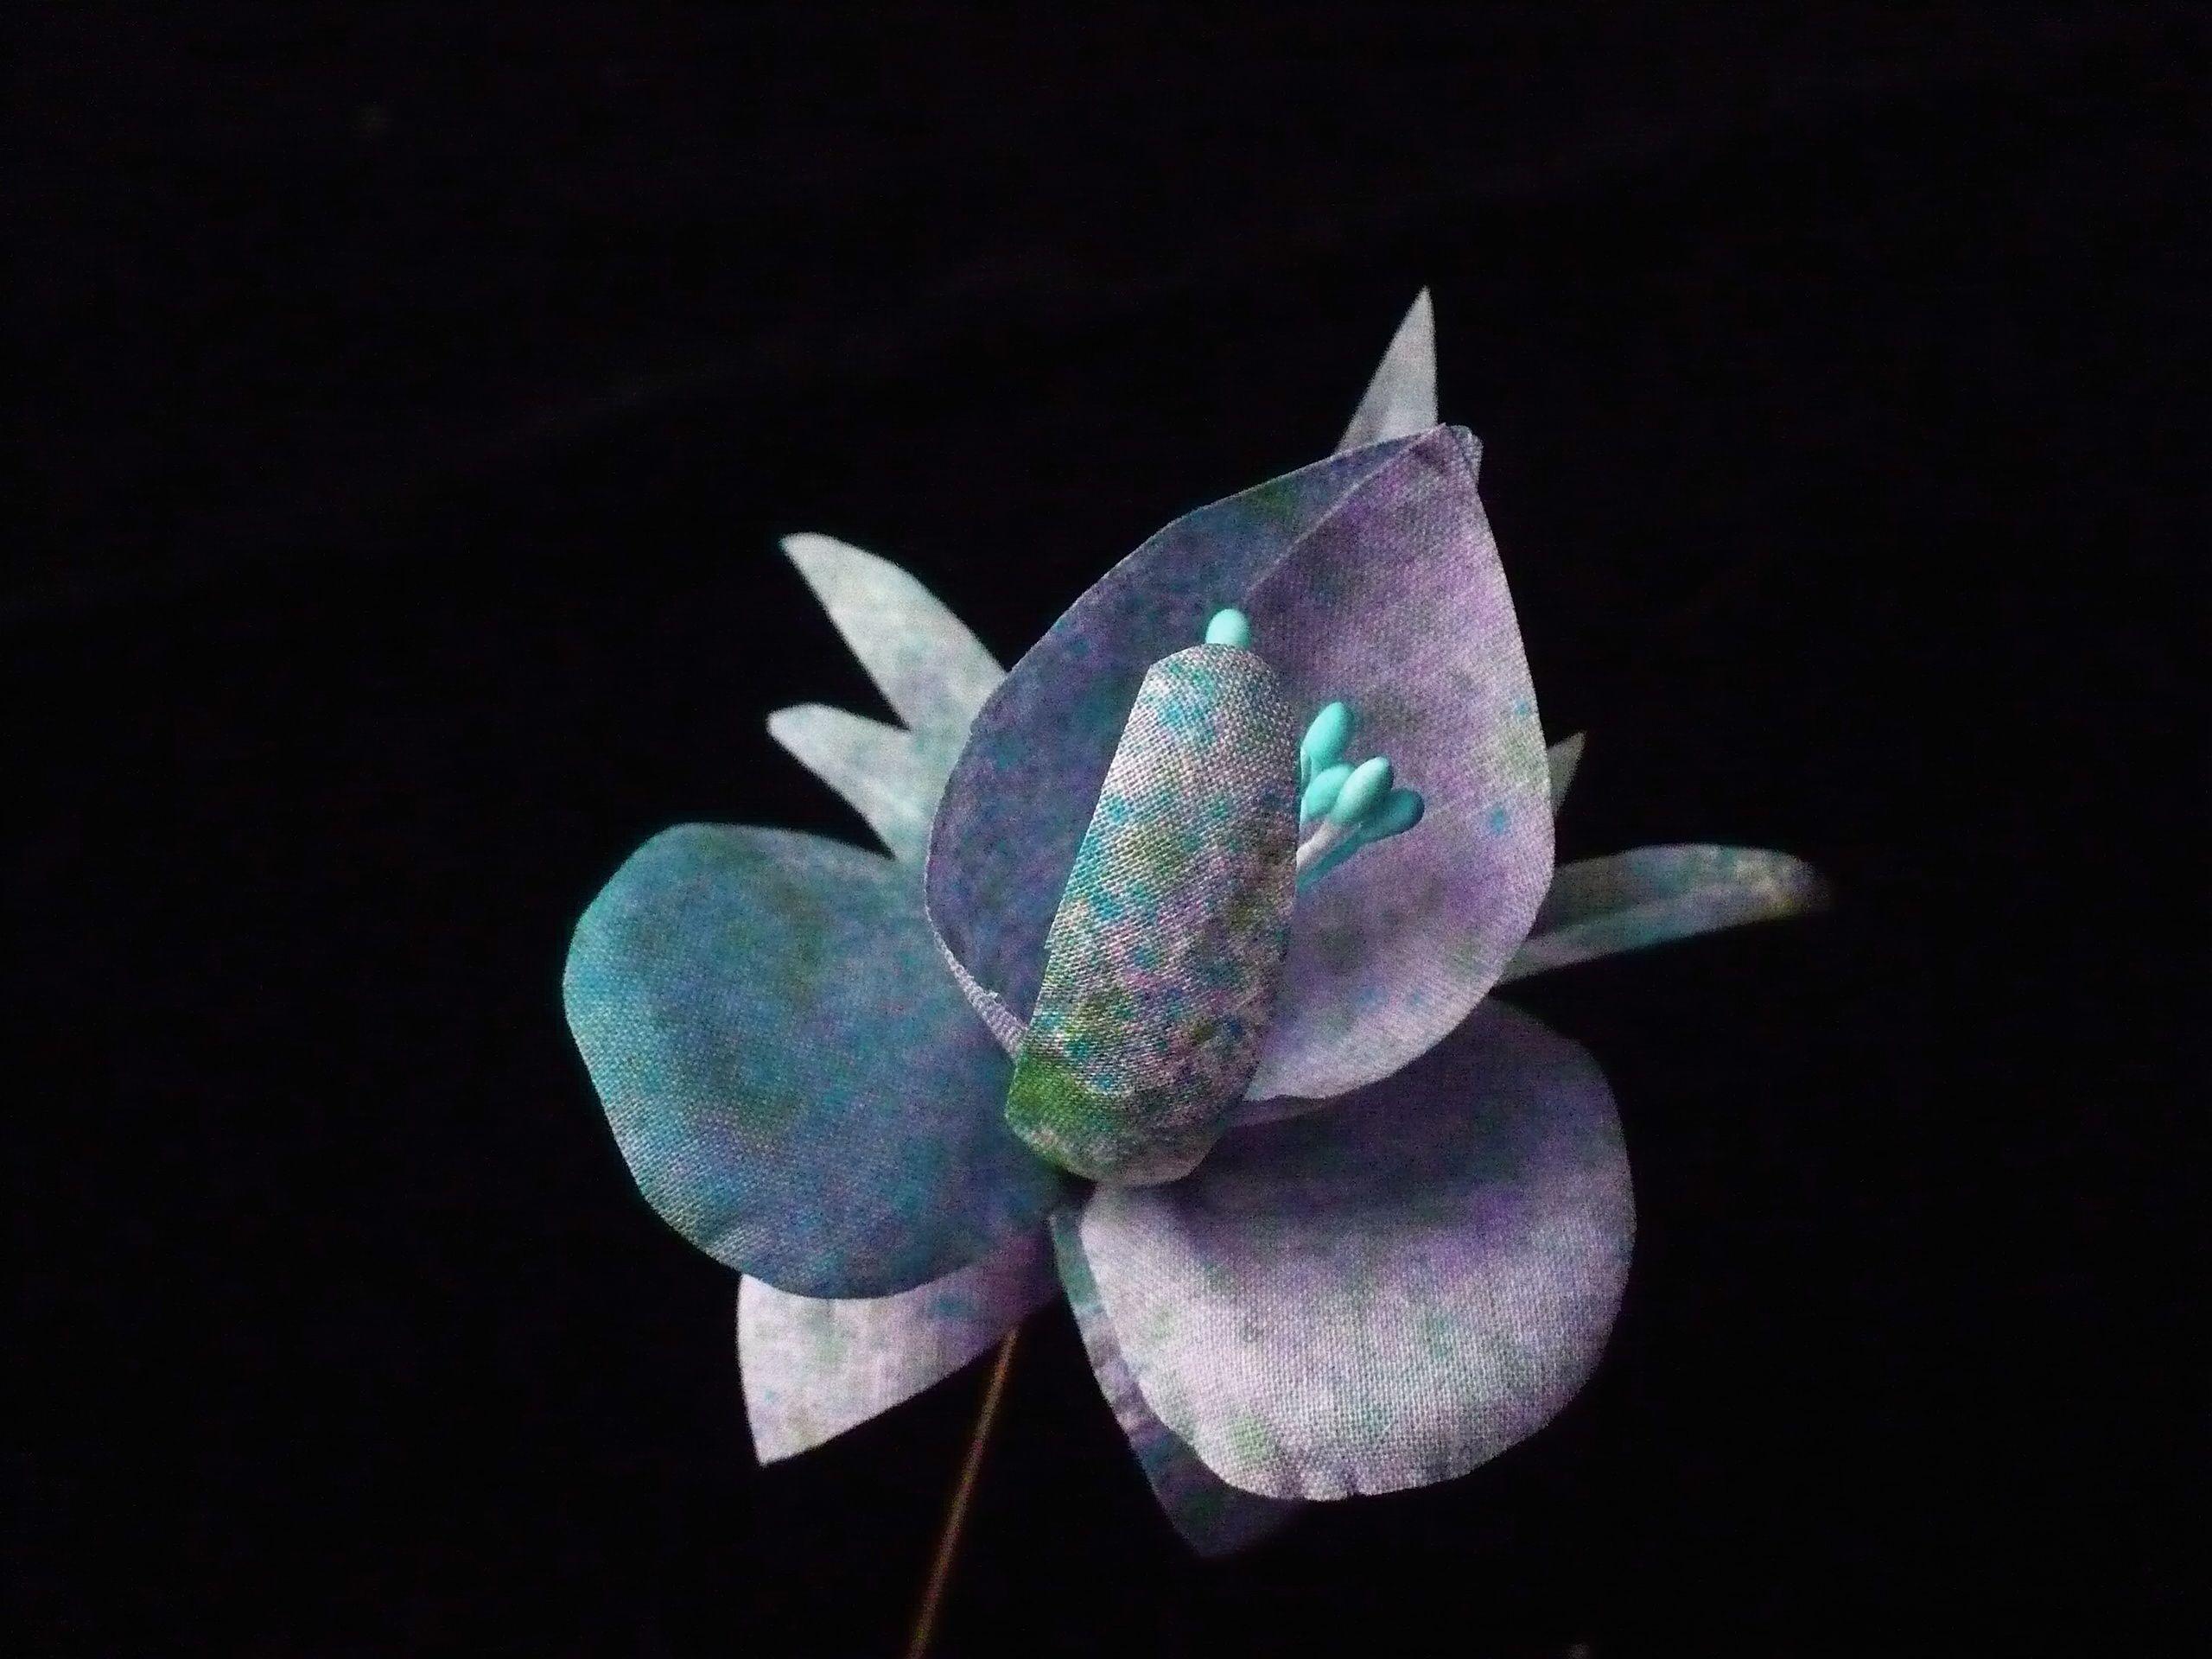 orquidea de lino tinte manual. Broche  28 $ 25 € Payment by paypal